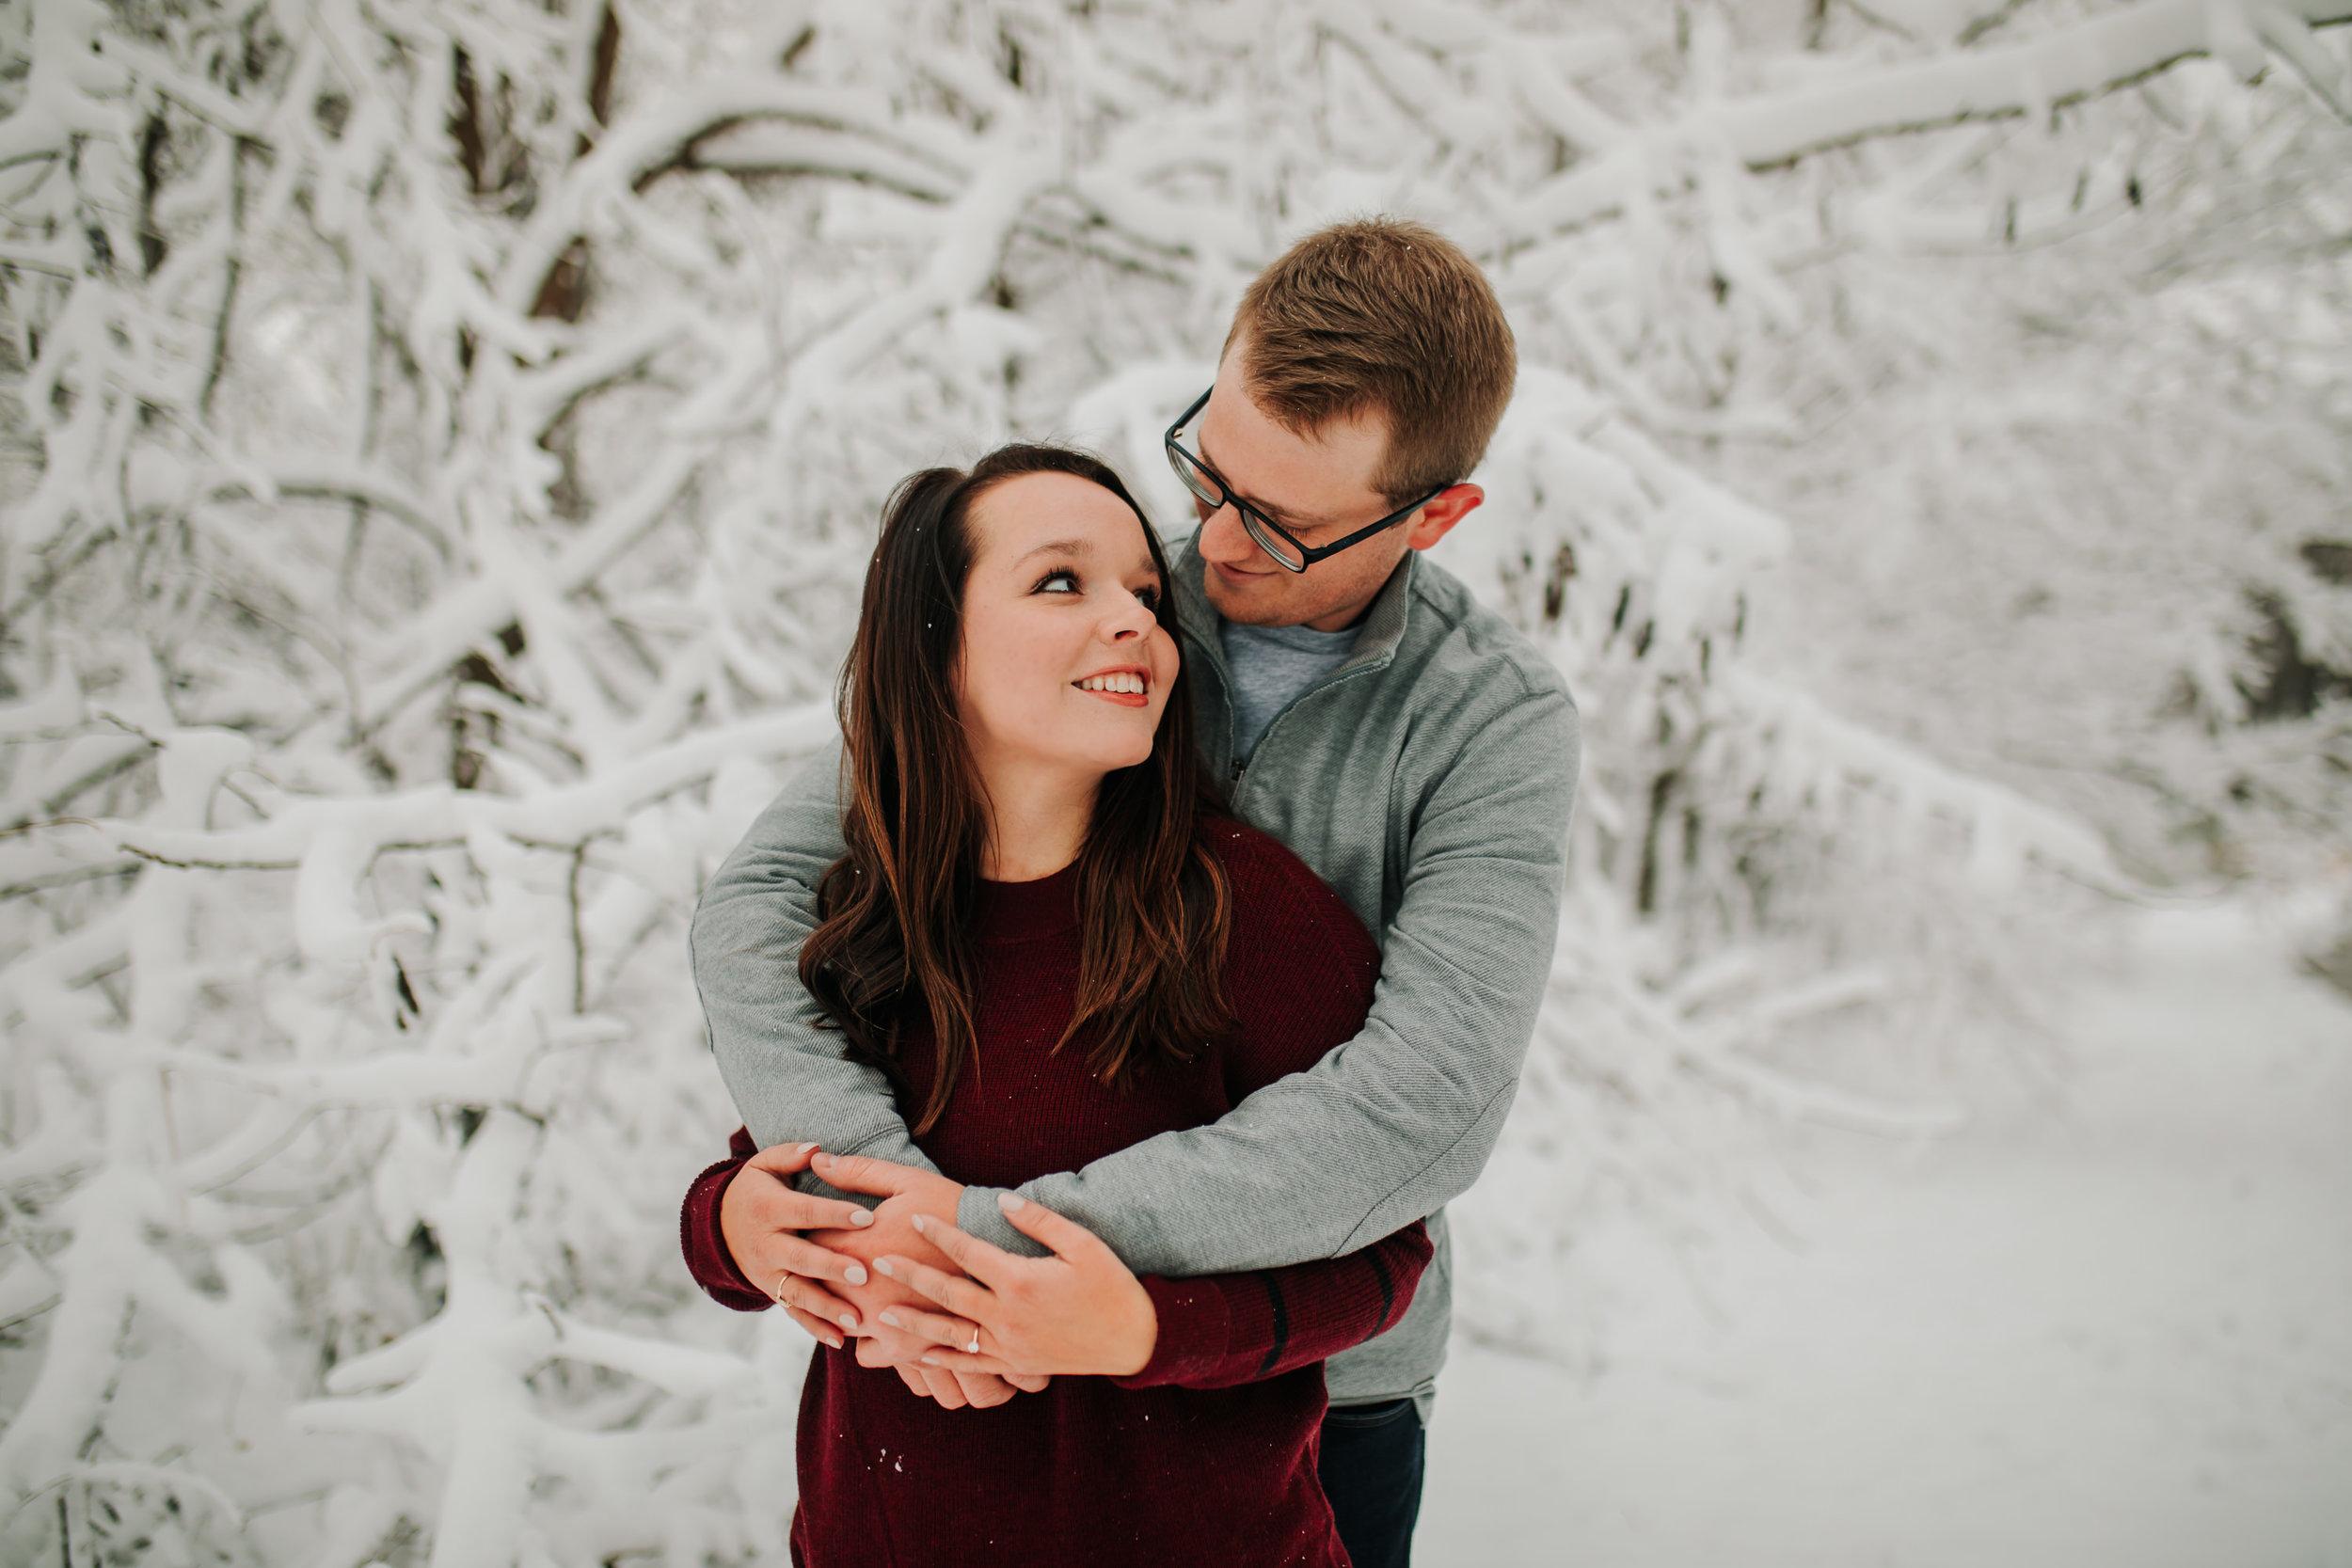 Vanessa & Dan - Engaged - Nathaniel Jensen Photography - Omaha Nebraska Wedding Photographer - Standing Bear Lake - Snowy Engagement Session-68.jpg